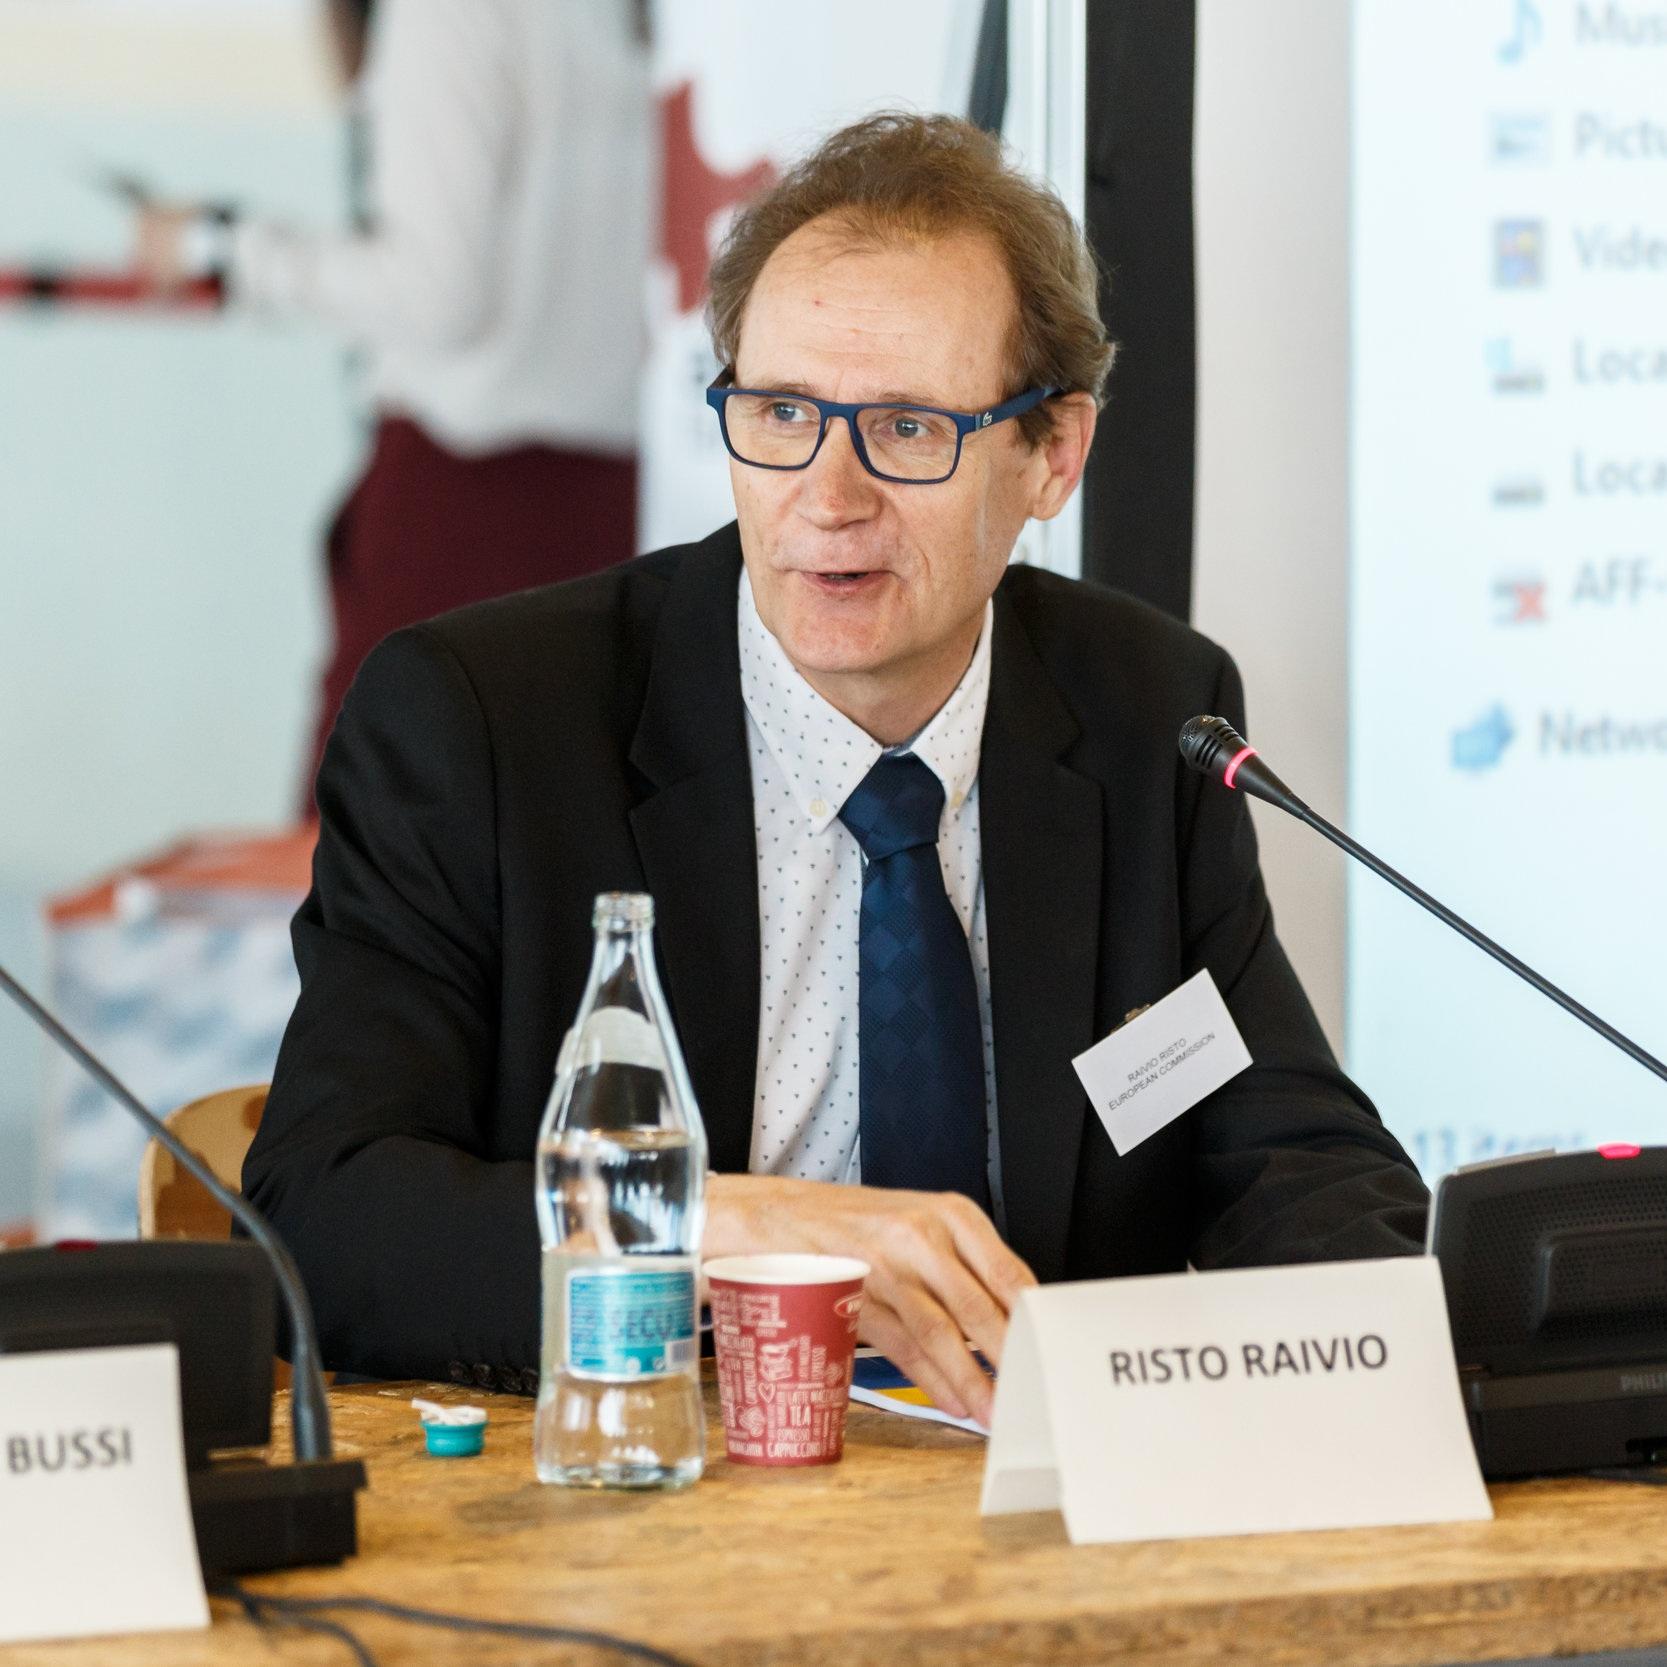 Risto RAIVIO  Expert, Comisia Europeana, DG Employment, Social Affairs and Inclusion   WISE: conexiuni cu agenda sociala UE